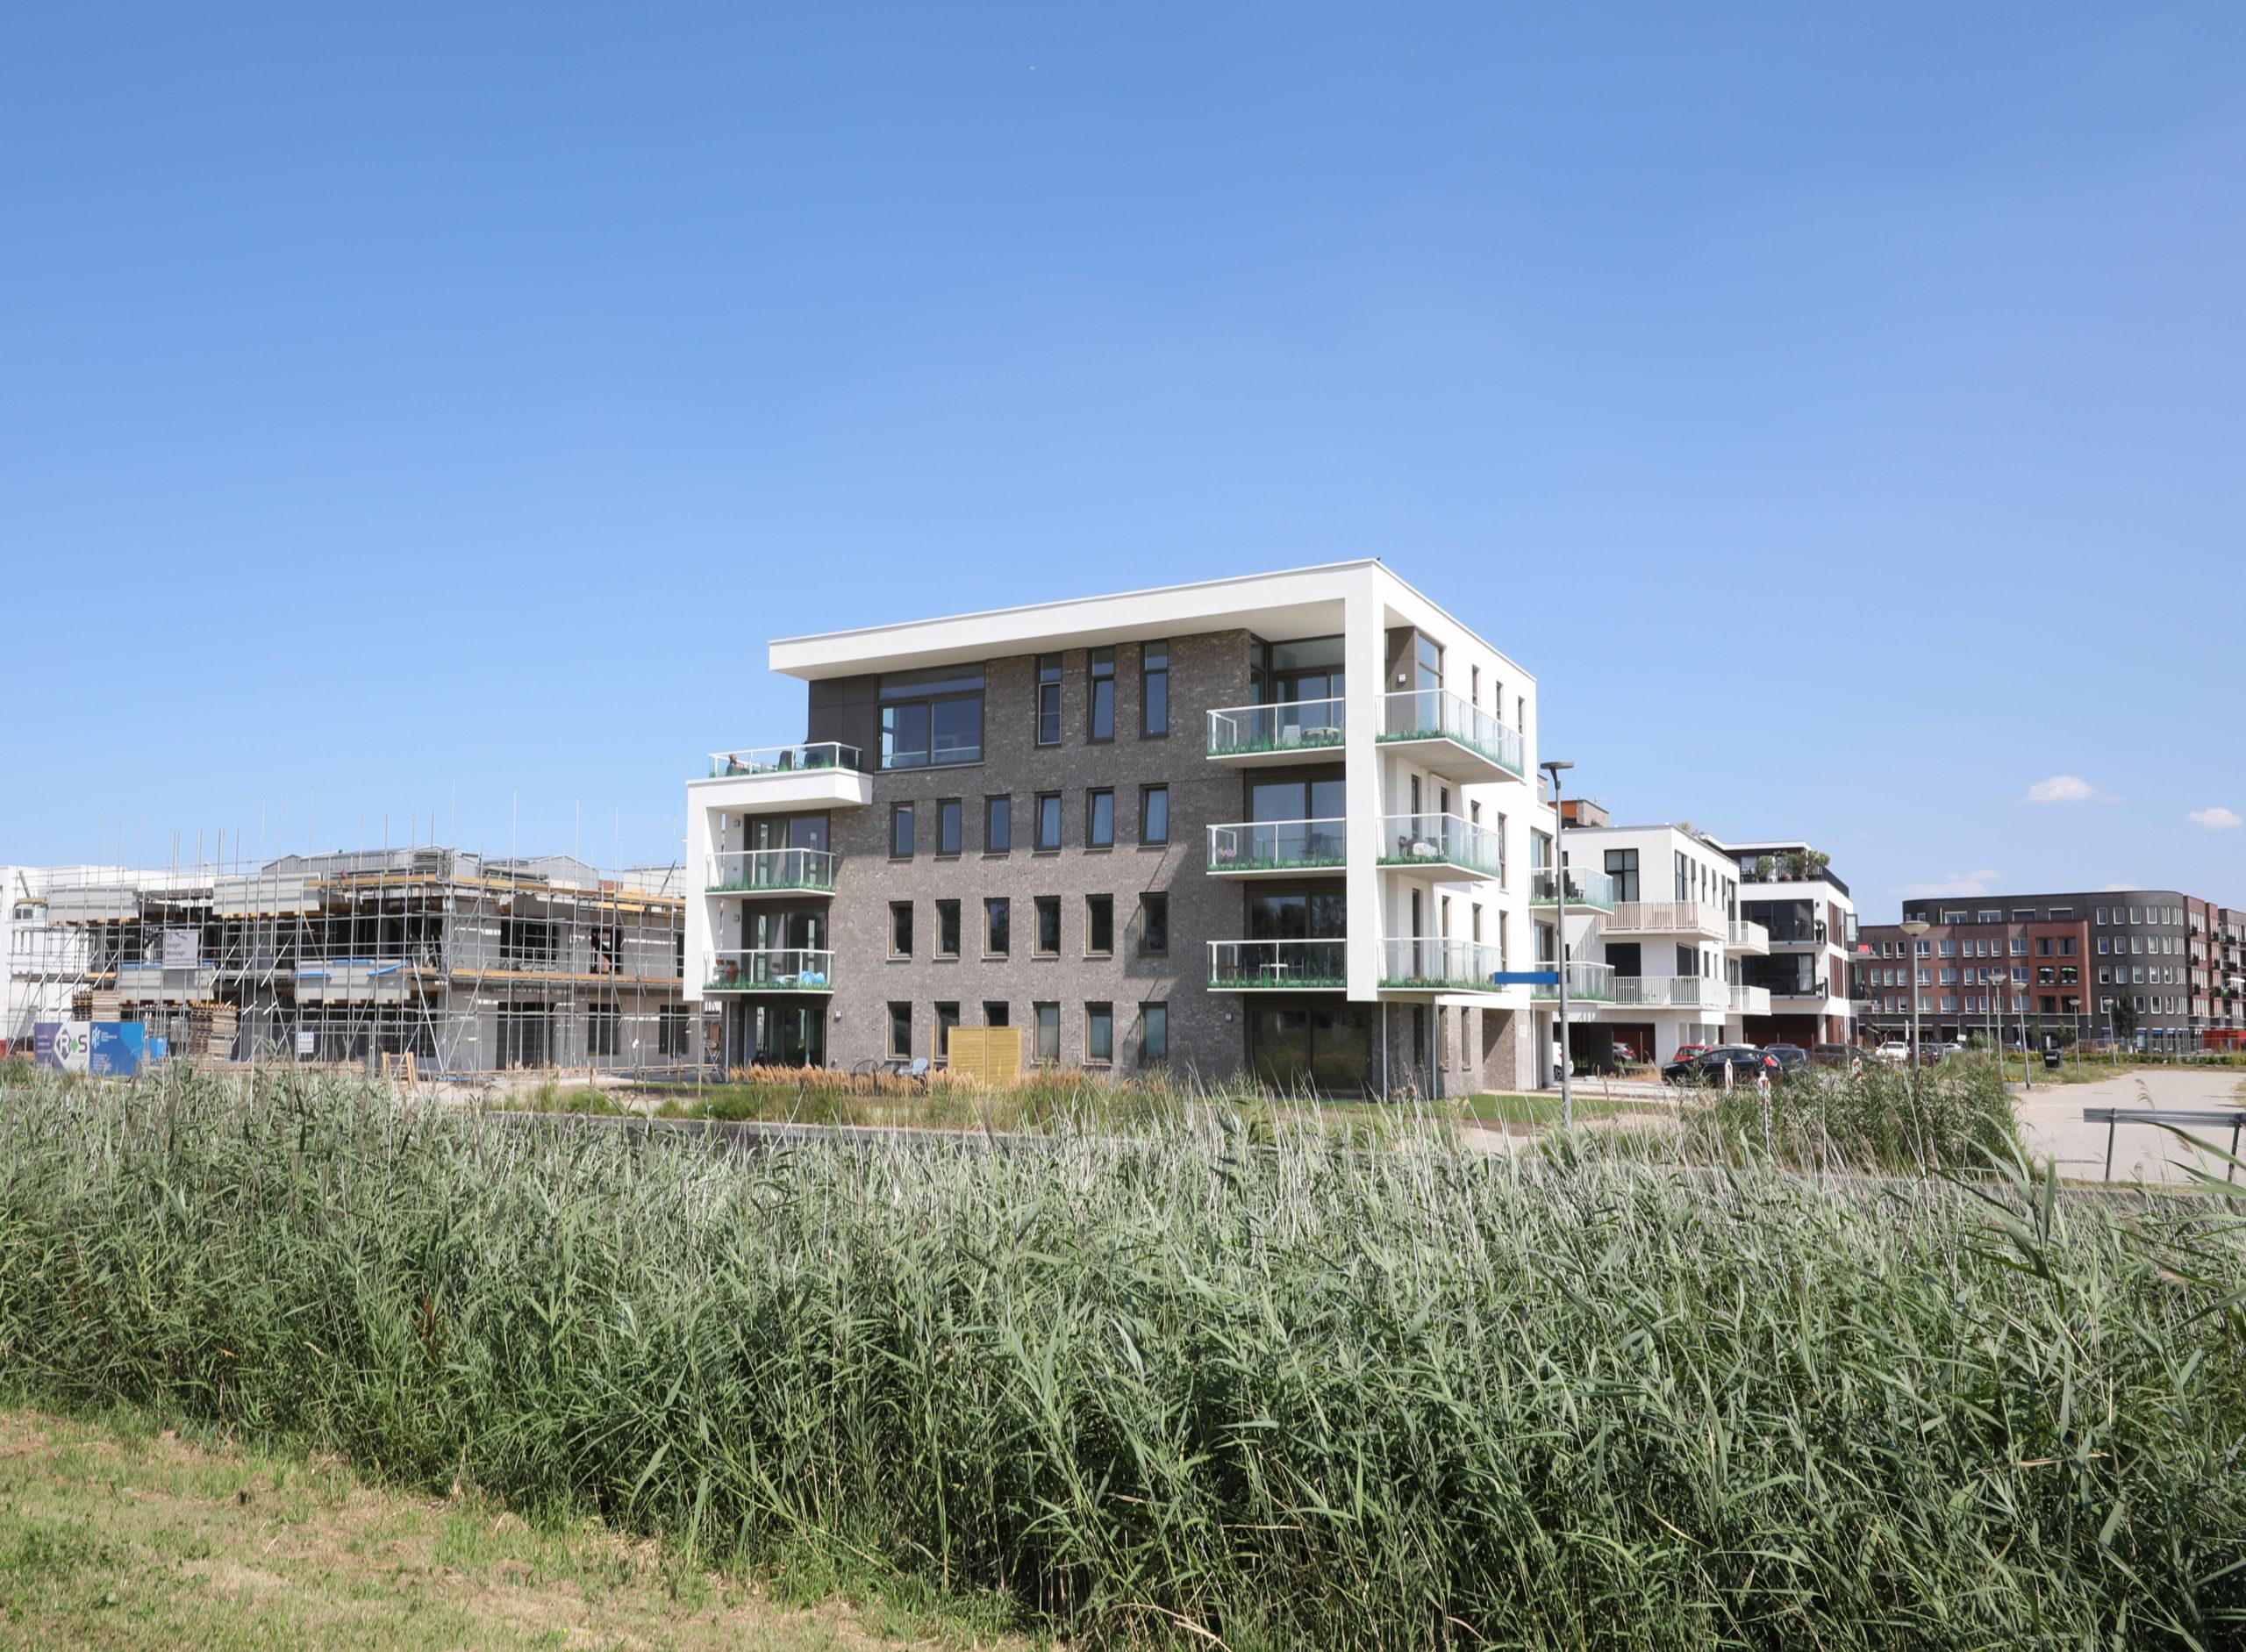 Appartementen complex Freestate Building Almere Poort | Olof Architects